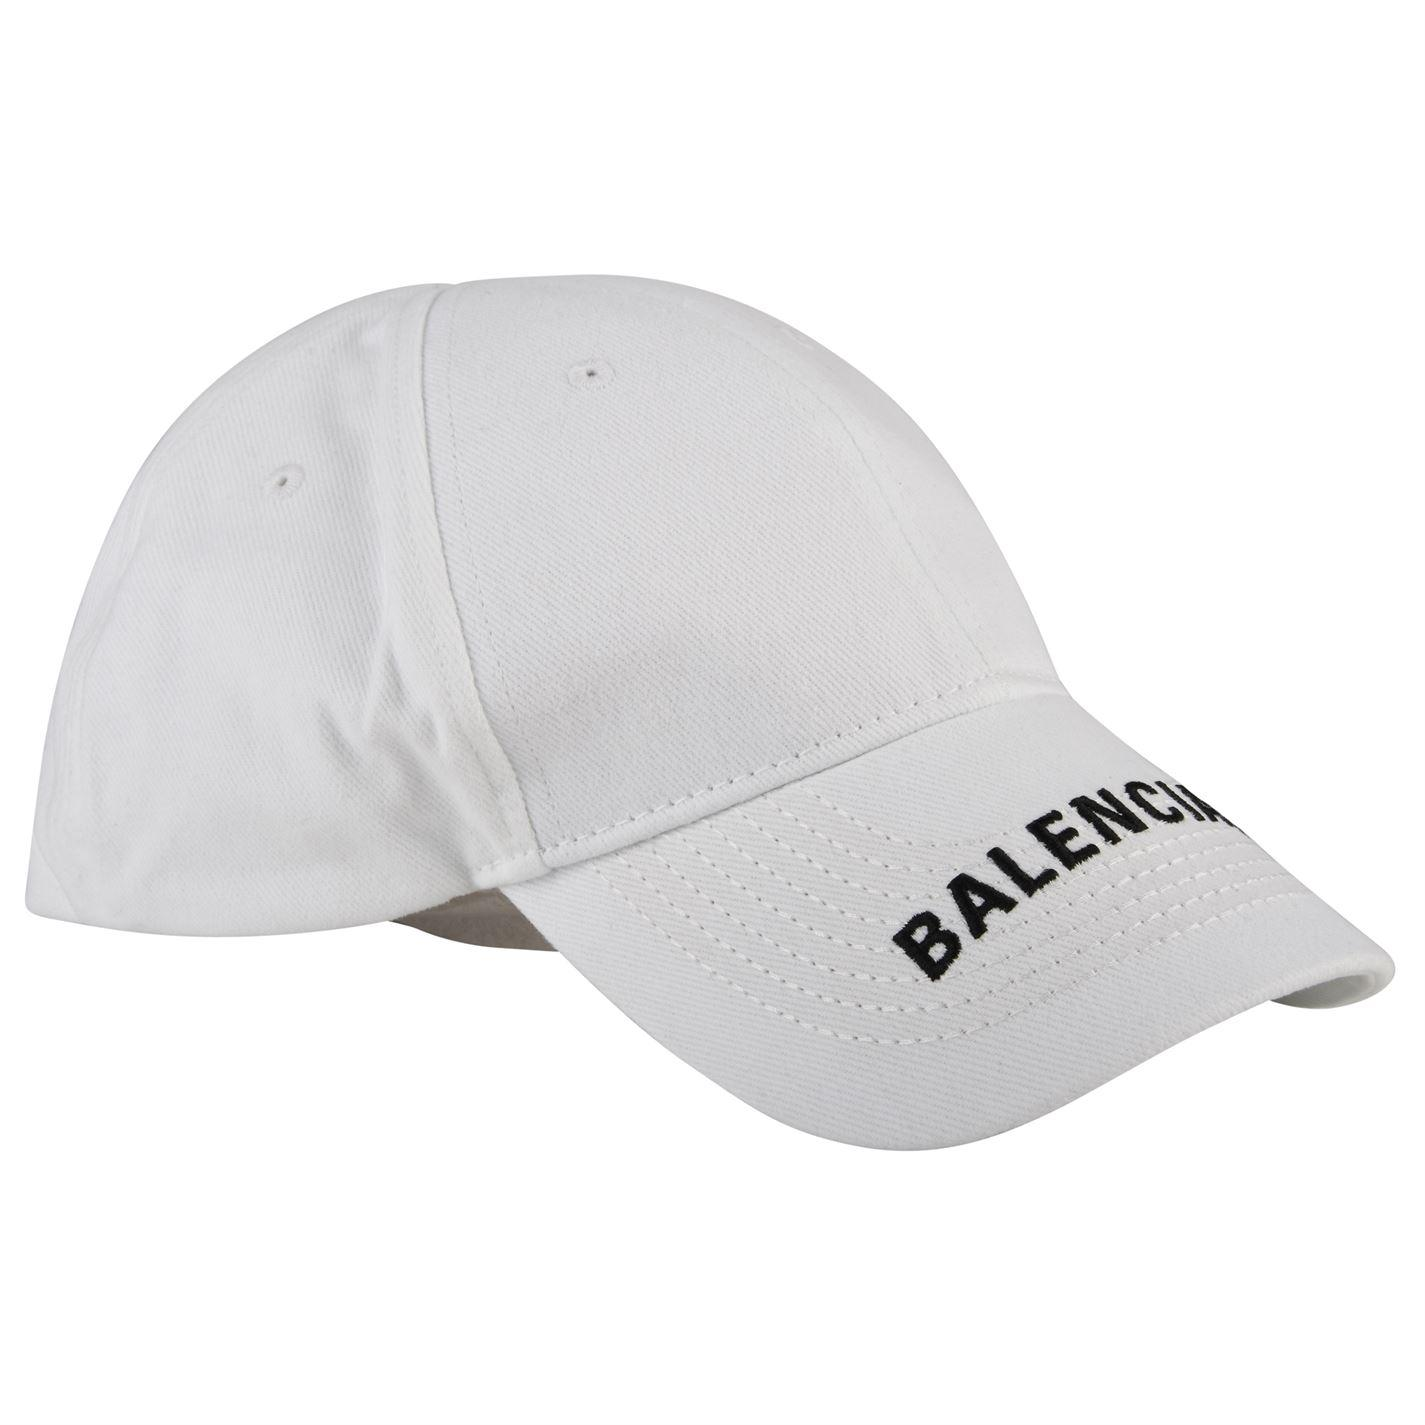 c1c30cf1 Lyst - Balenciaga Logo Cap in White